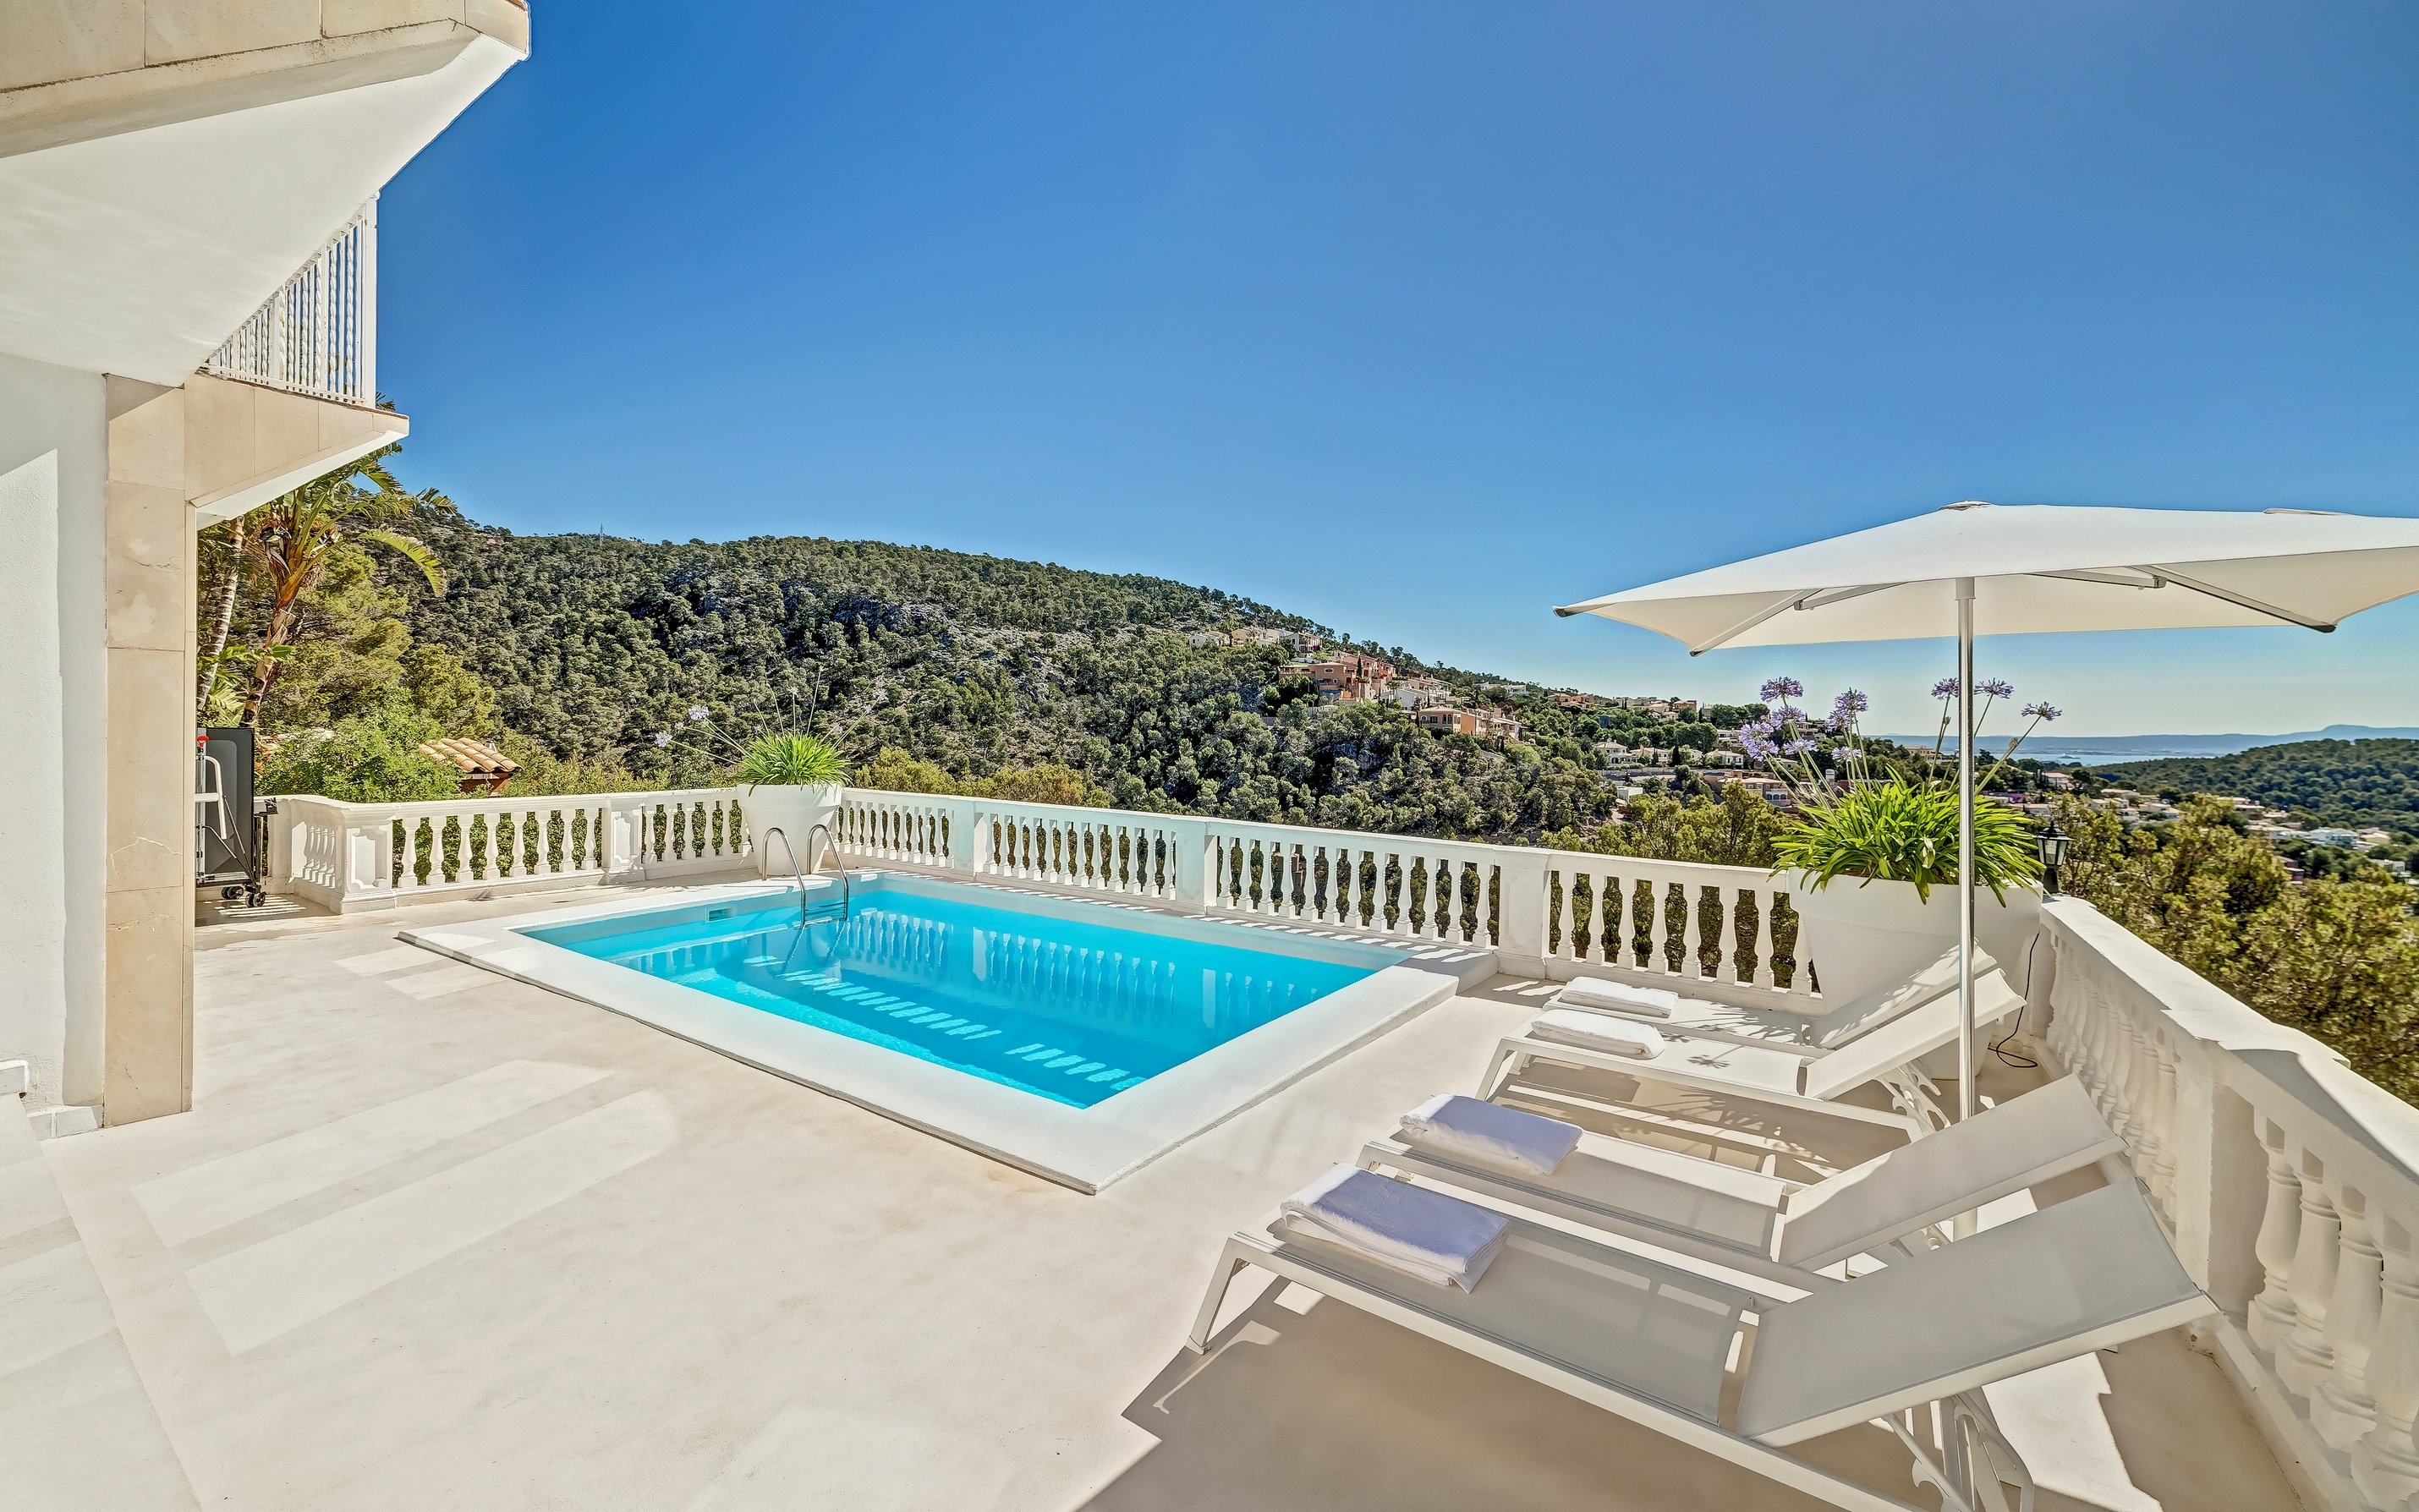 Luxury villa for sale in Costa dén Blanes | 9723 | Mallorca